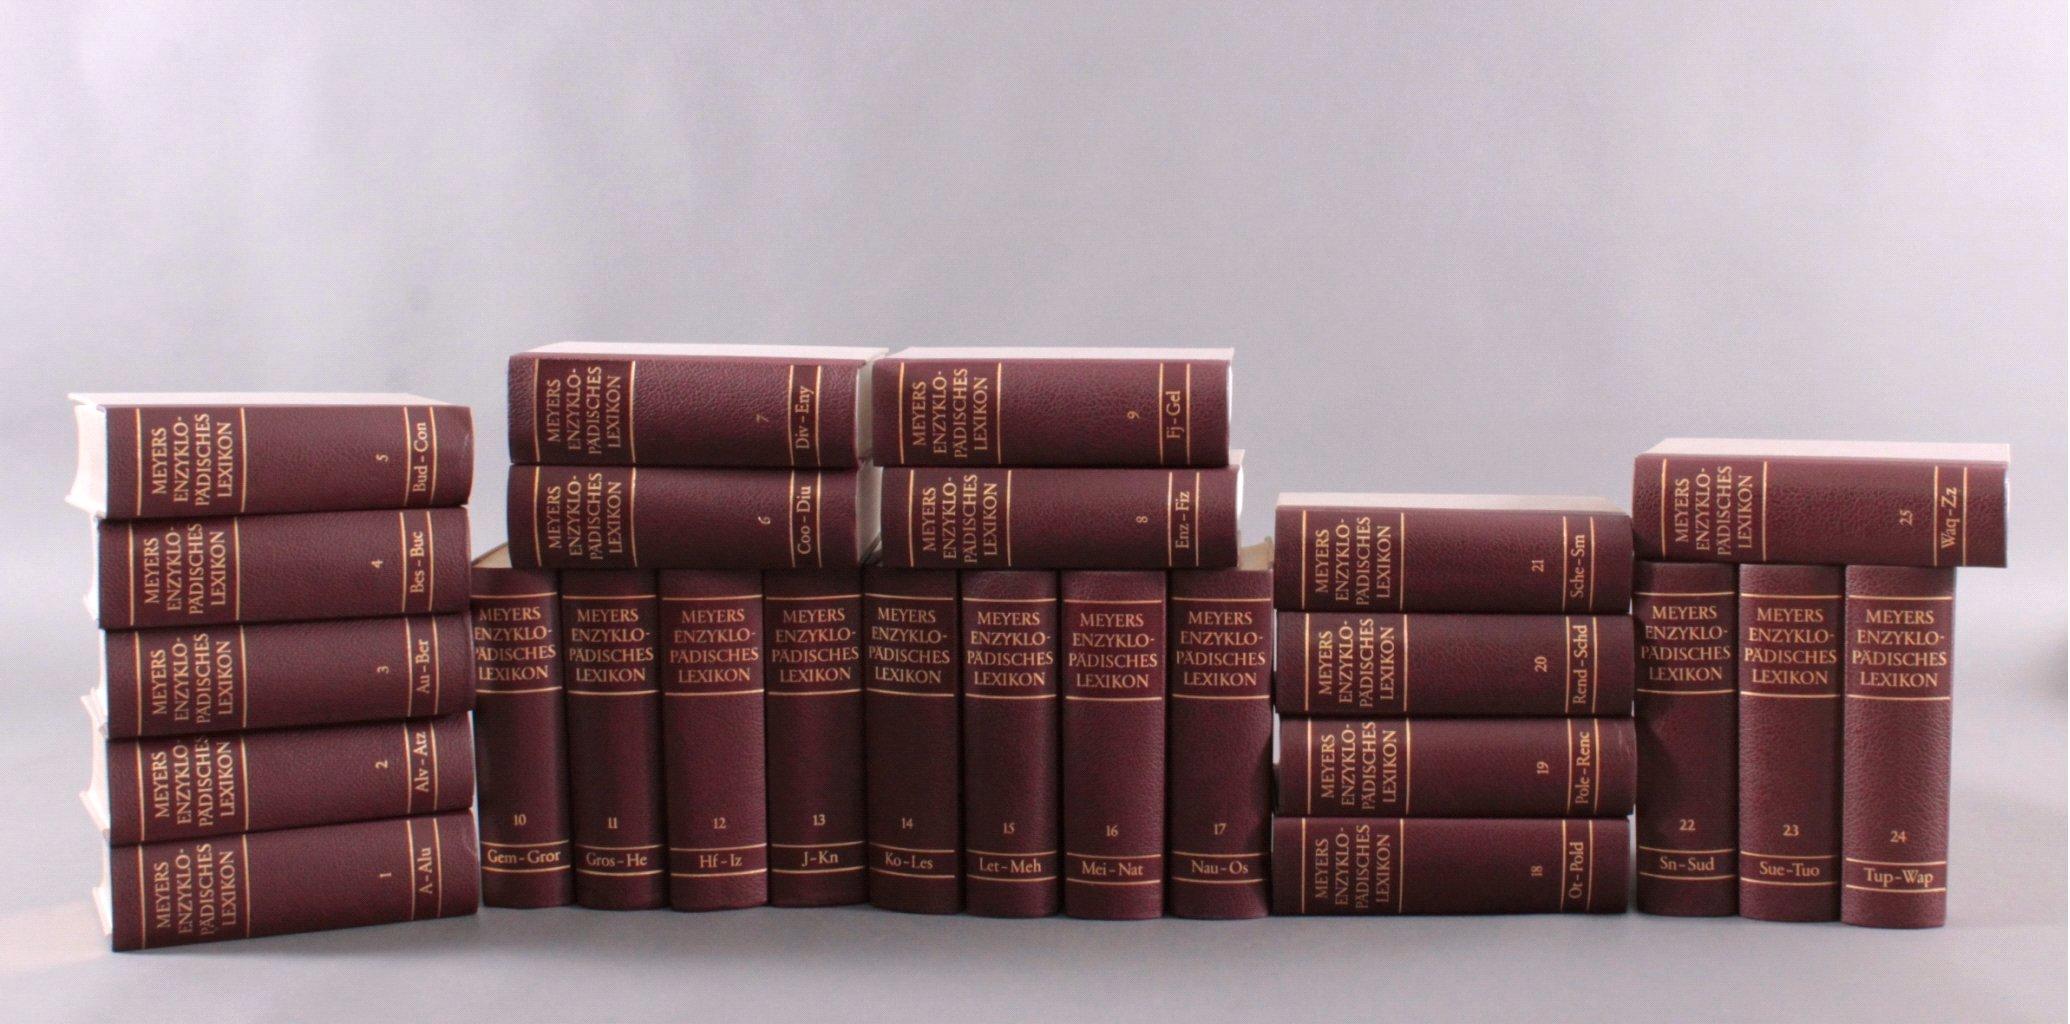 Meyers Enzyklopädisches Lexikon